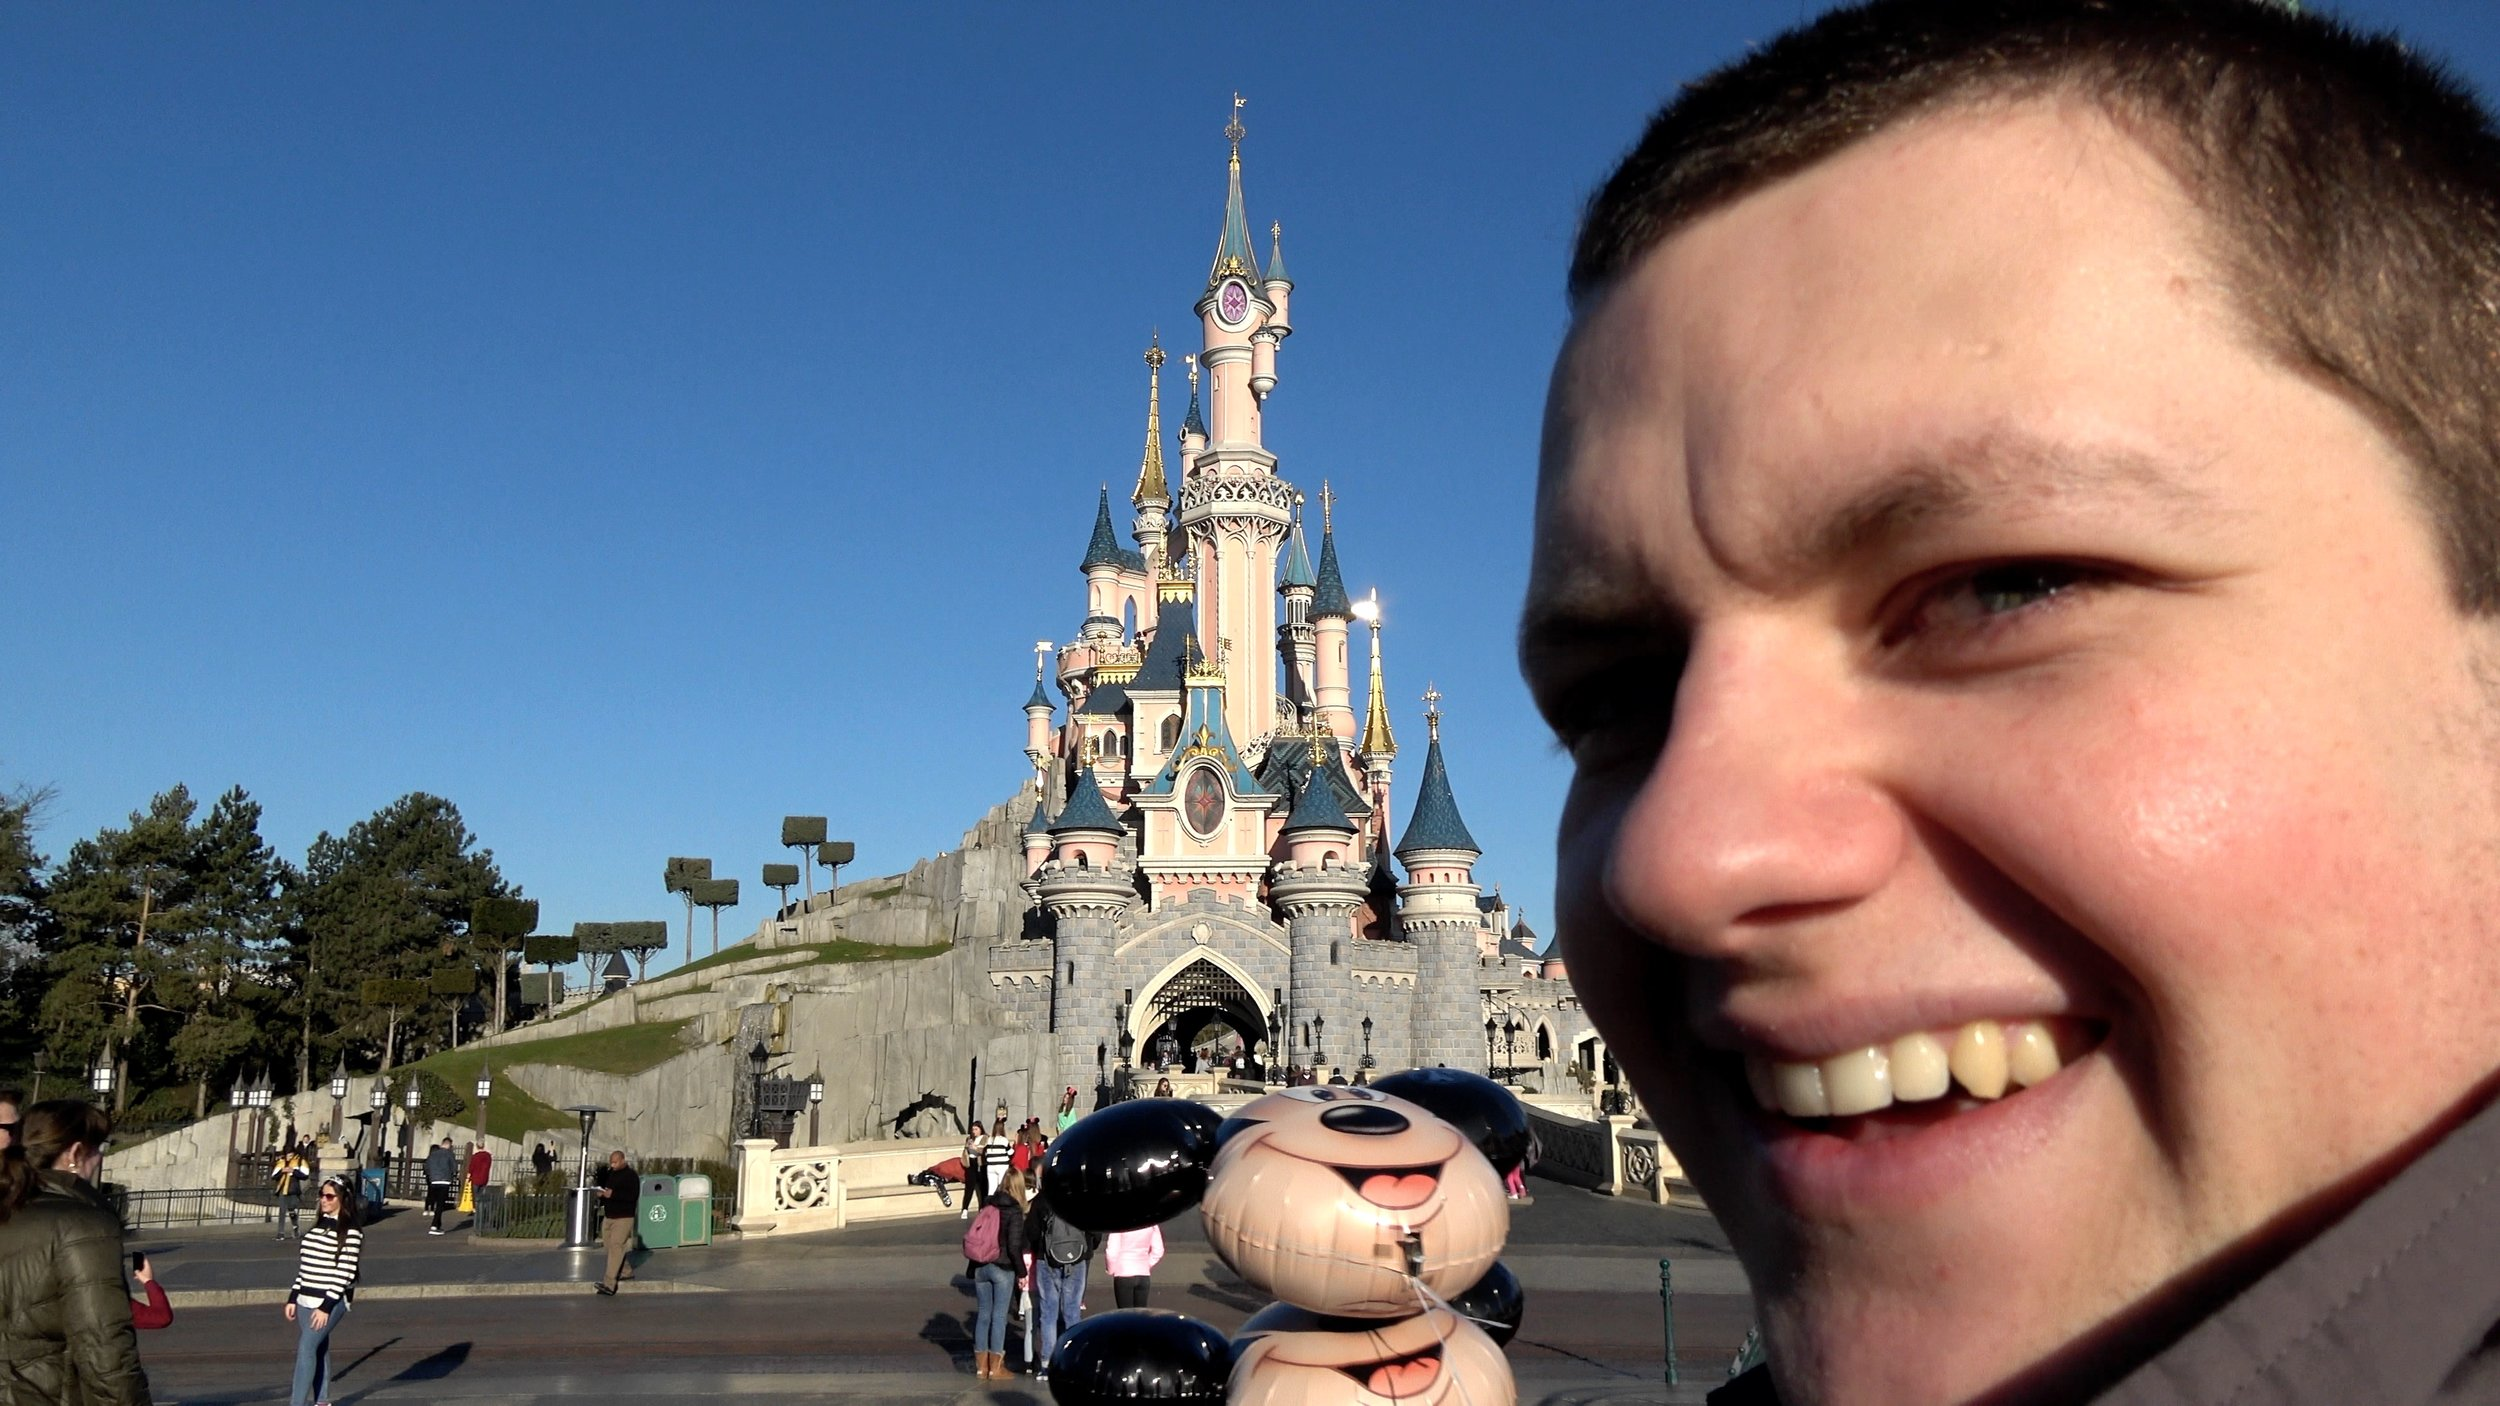 Disneyland Paris 2019 Fun.jpg